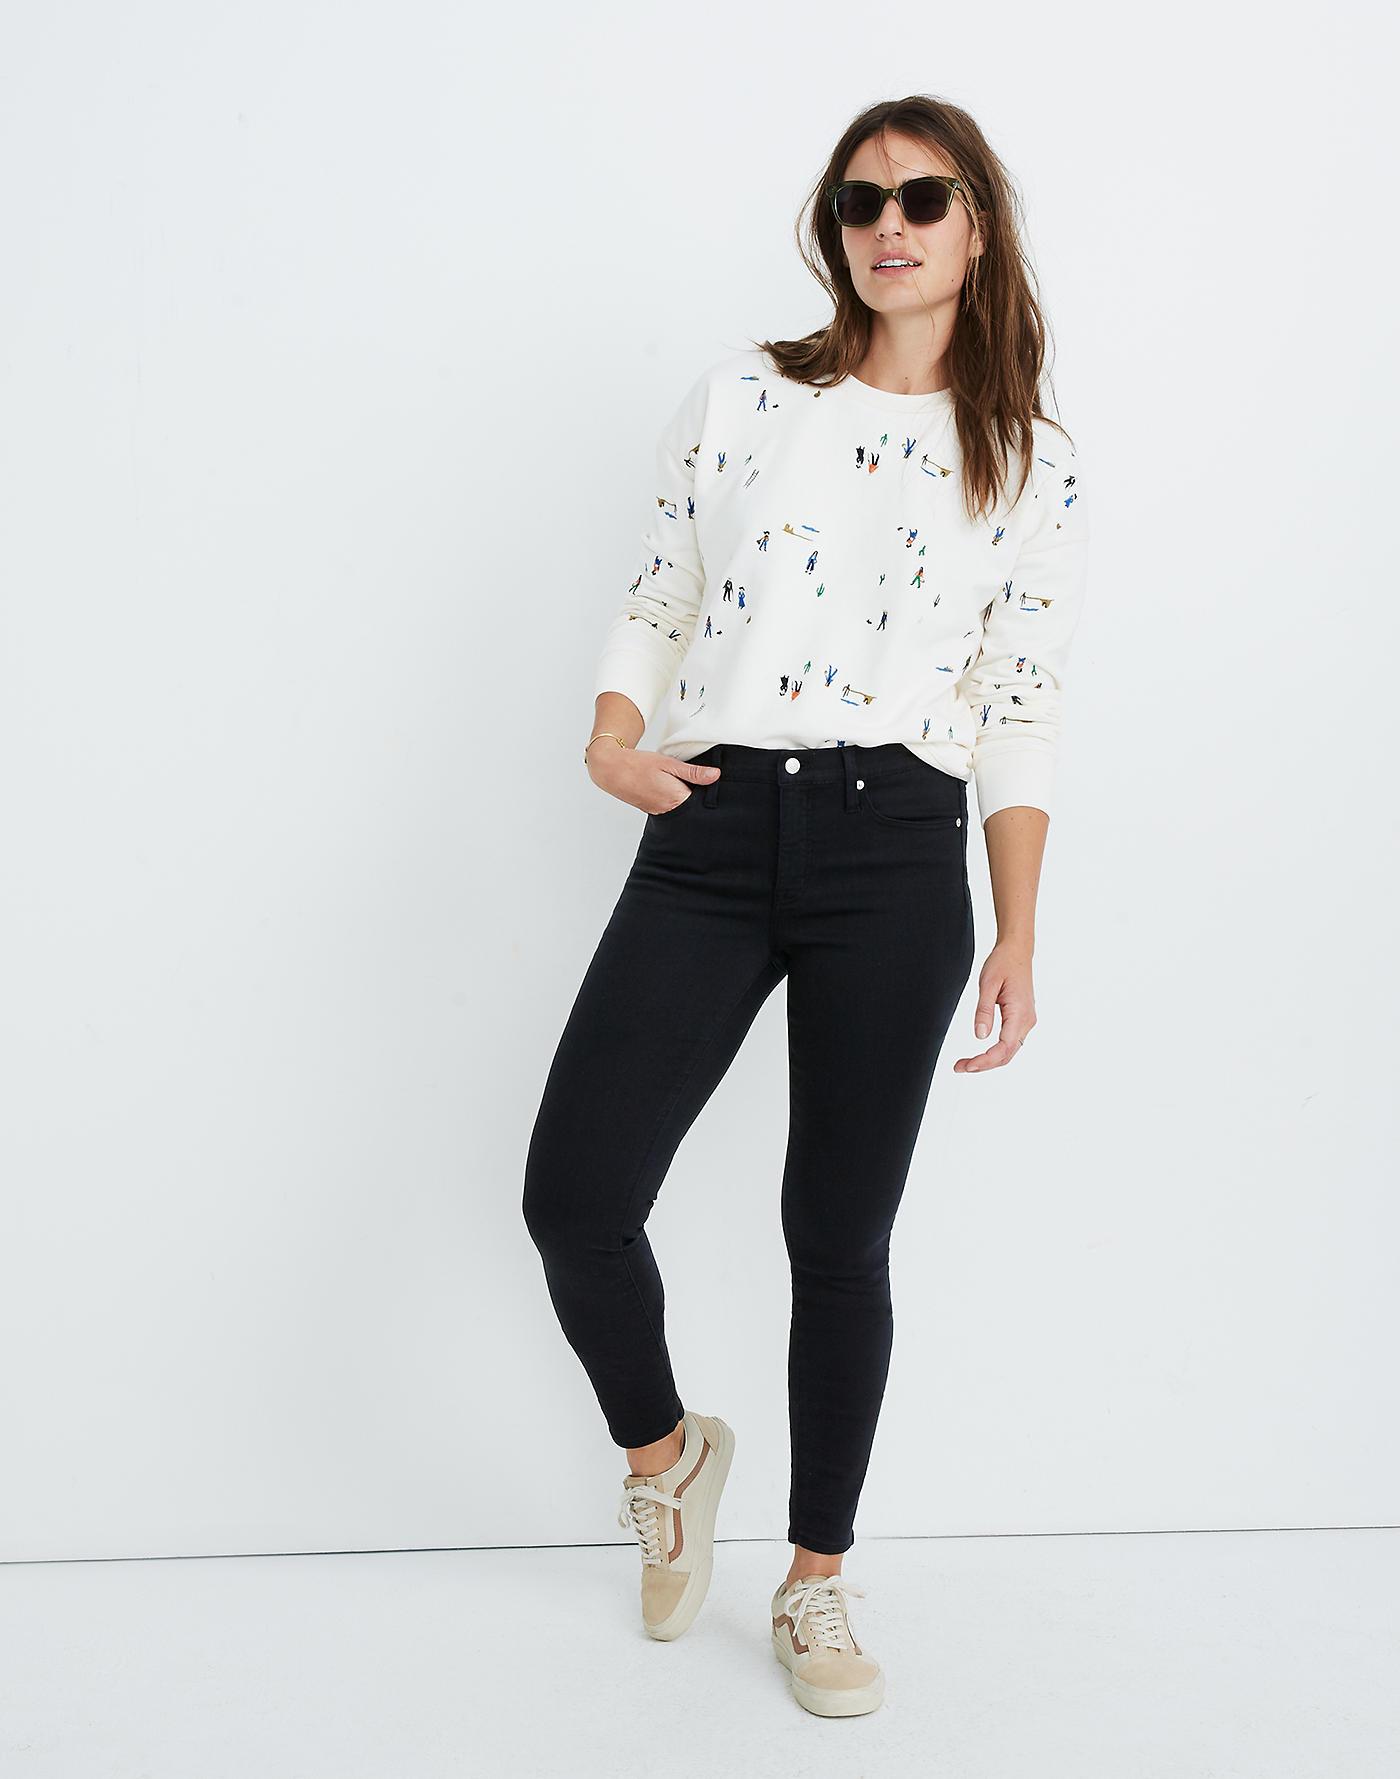 Madewell 9 Mid-Rise Skinny Jeans in Lunar Wash: TENCEL Denim Edition